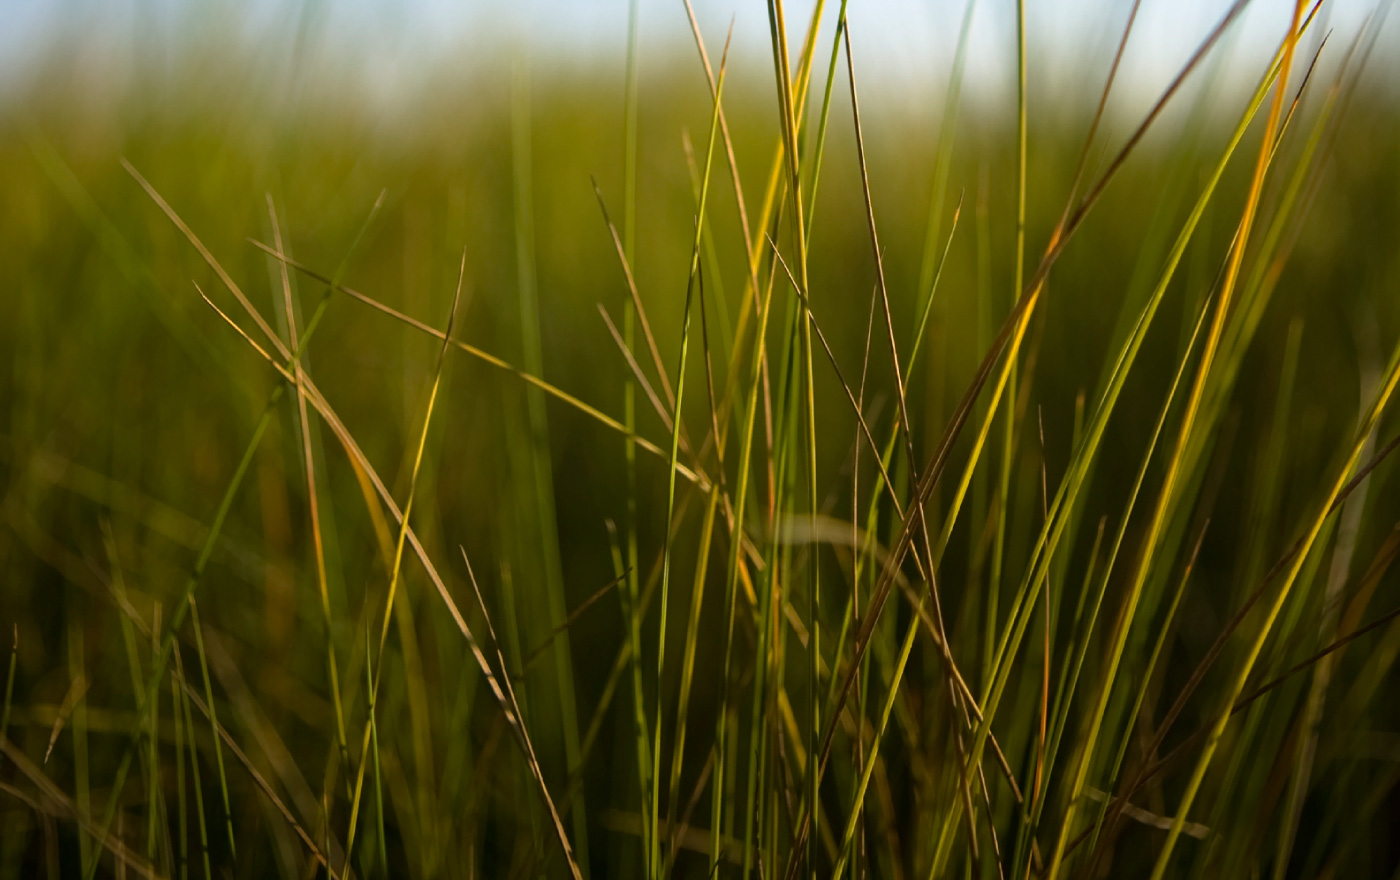 coastal grass texture